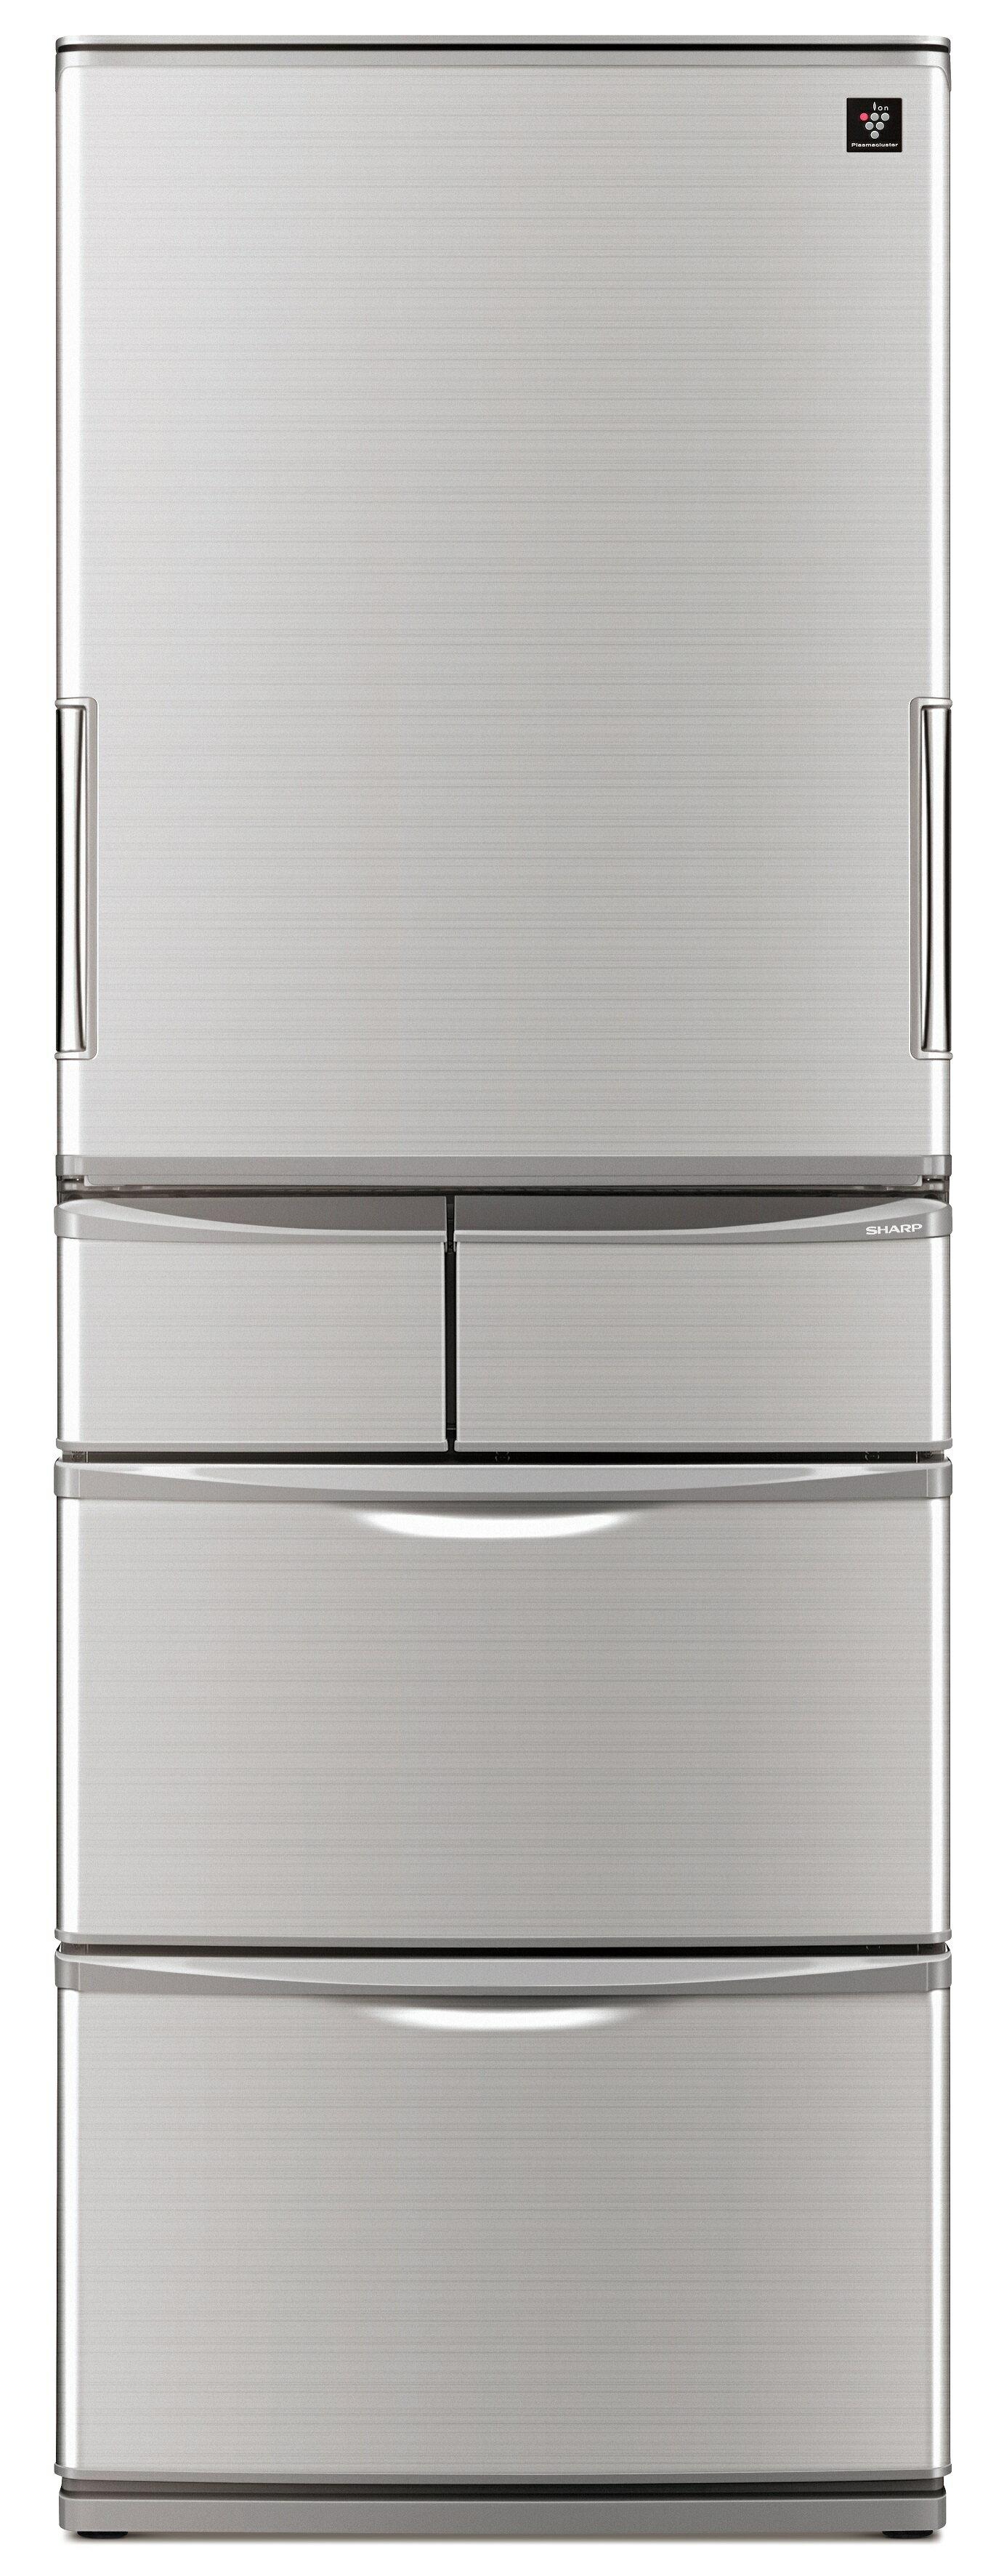 <br/><br/>  SHARP 夏普 SJ-XW44BT-N (晶燦銀) 變頻左右開五門冰箱 (440L) ~日本製~【零利率】※熱線07-7428010<br/><br/>